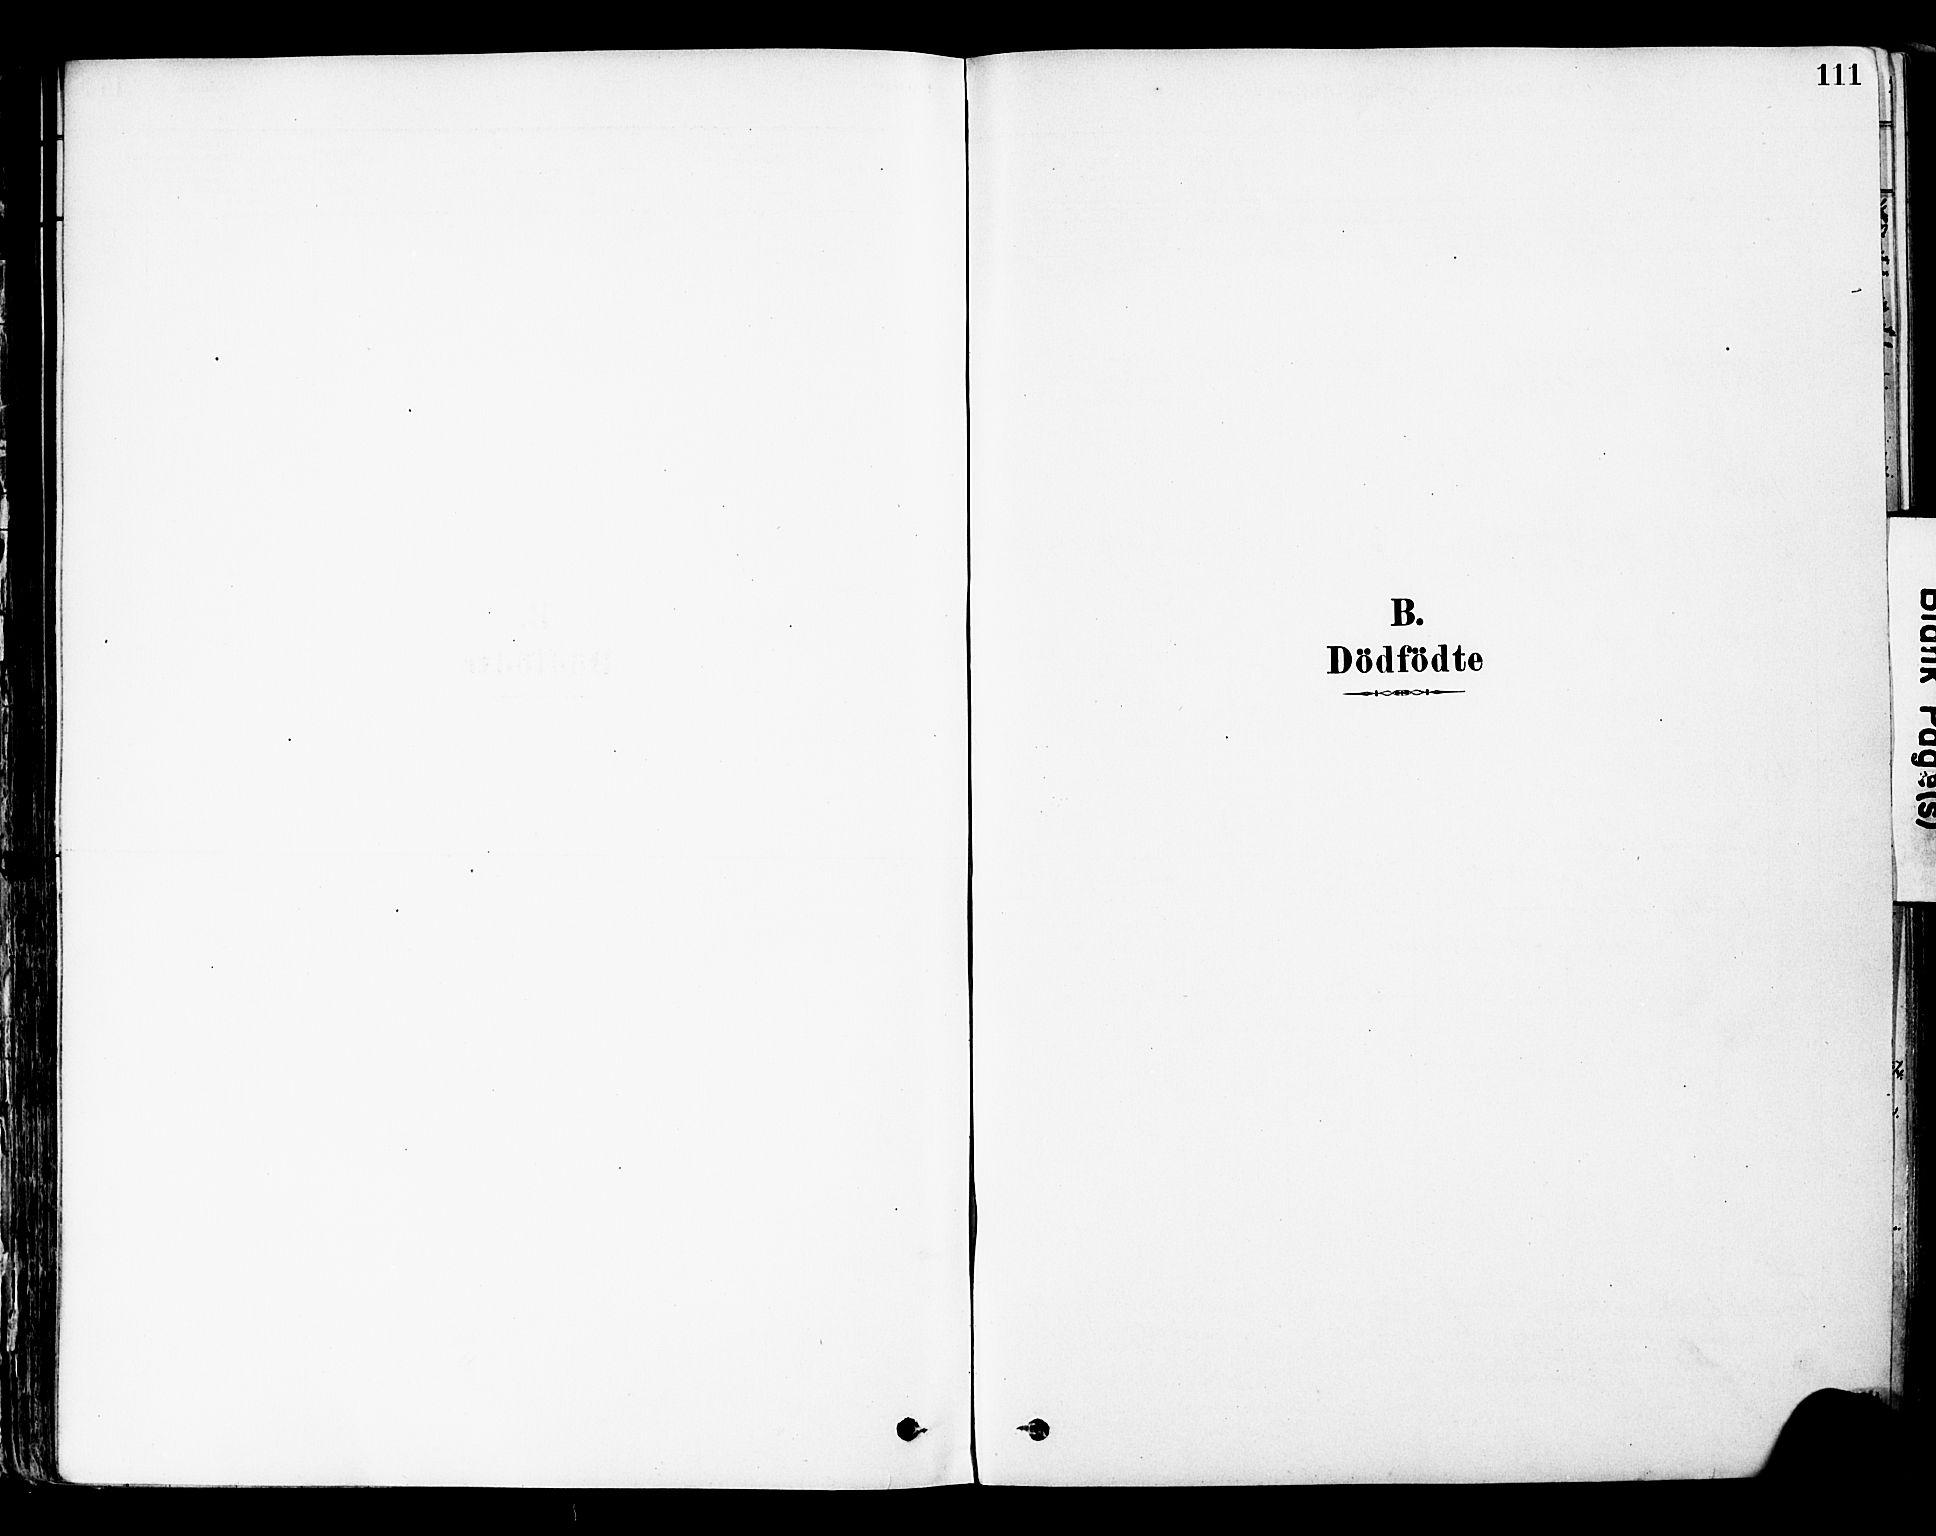 SAH, Øyer prestekontor, Ministerialbok nr. 8, 1878-1897, s. 111